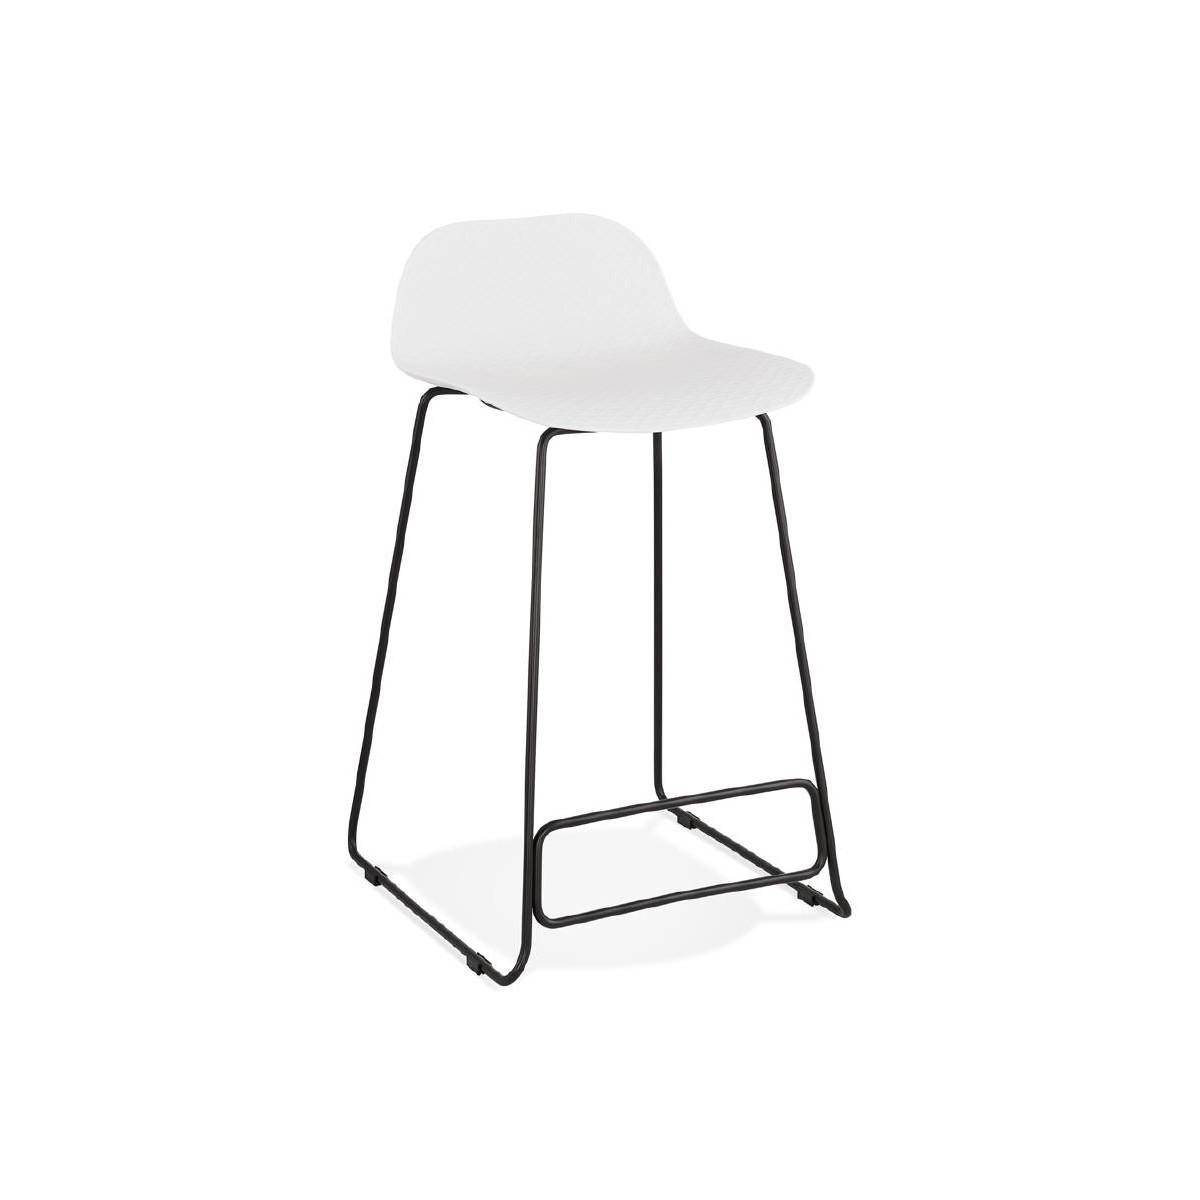 Bar Stool Design Mid Height Ulysses Mini Feet White Black Metal Bar Chair Amp Story 5623